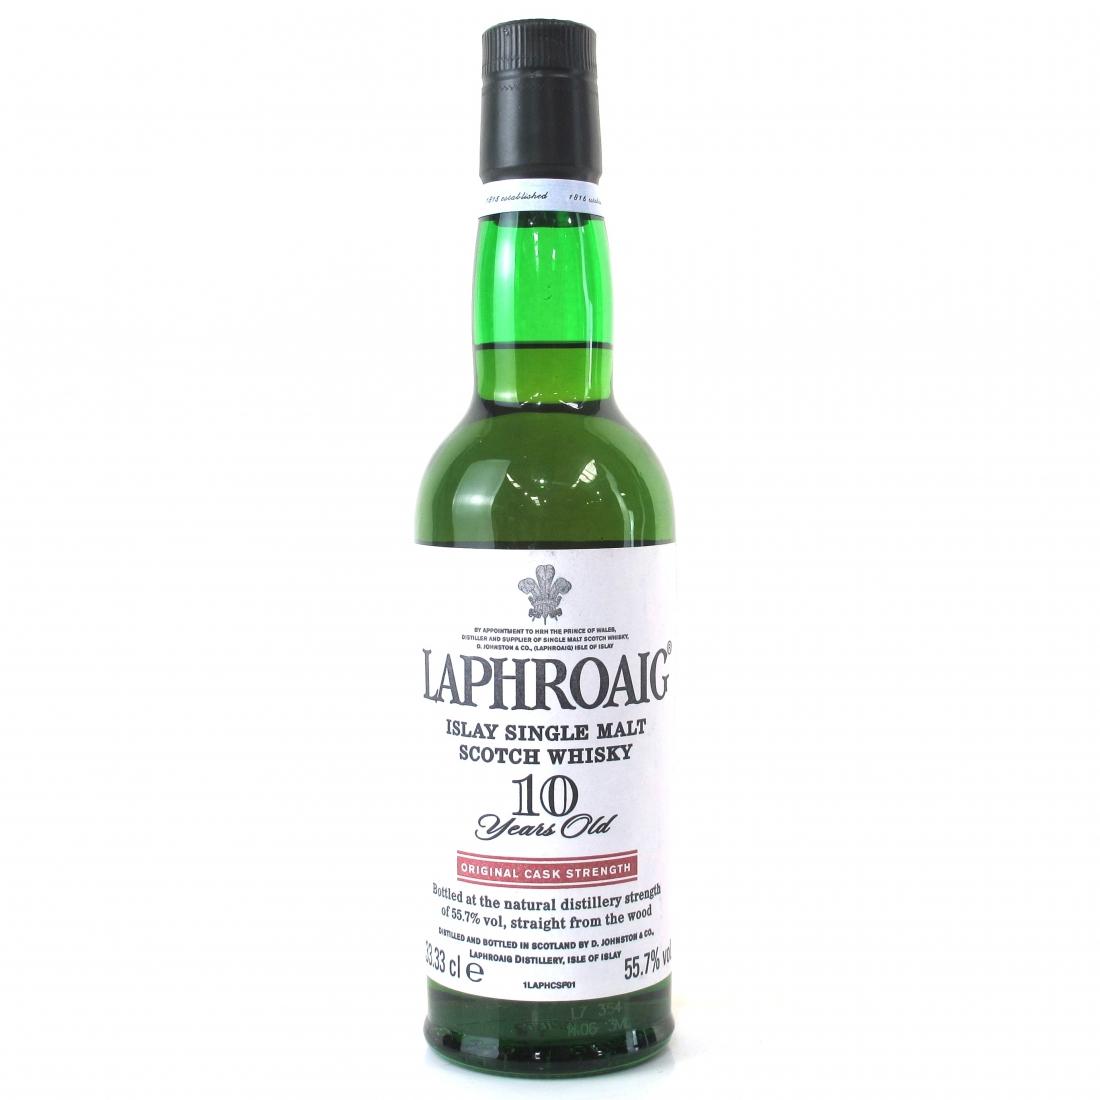 Laphroaig 10 Year Old Original Cask Strength 55.7% 33.3cl